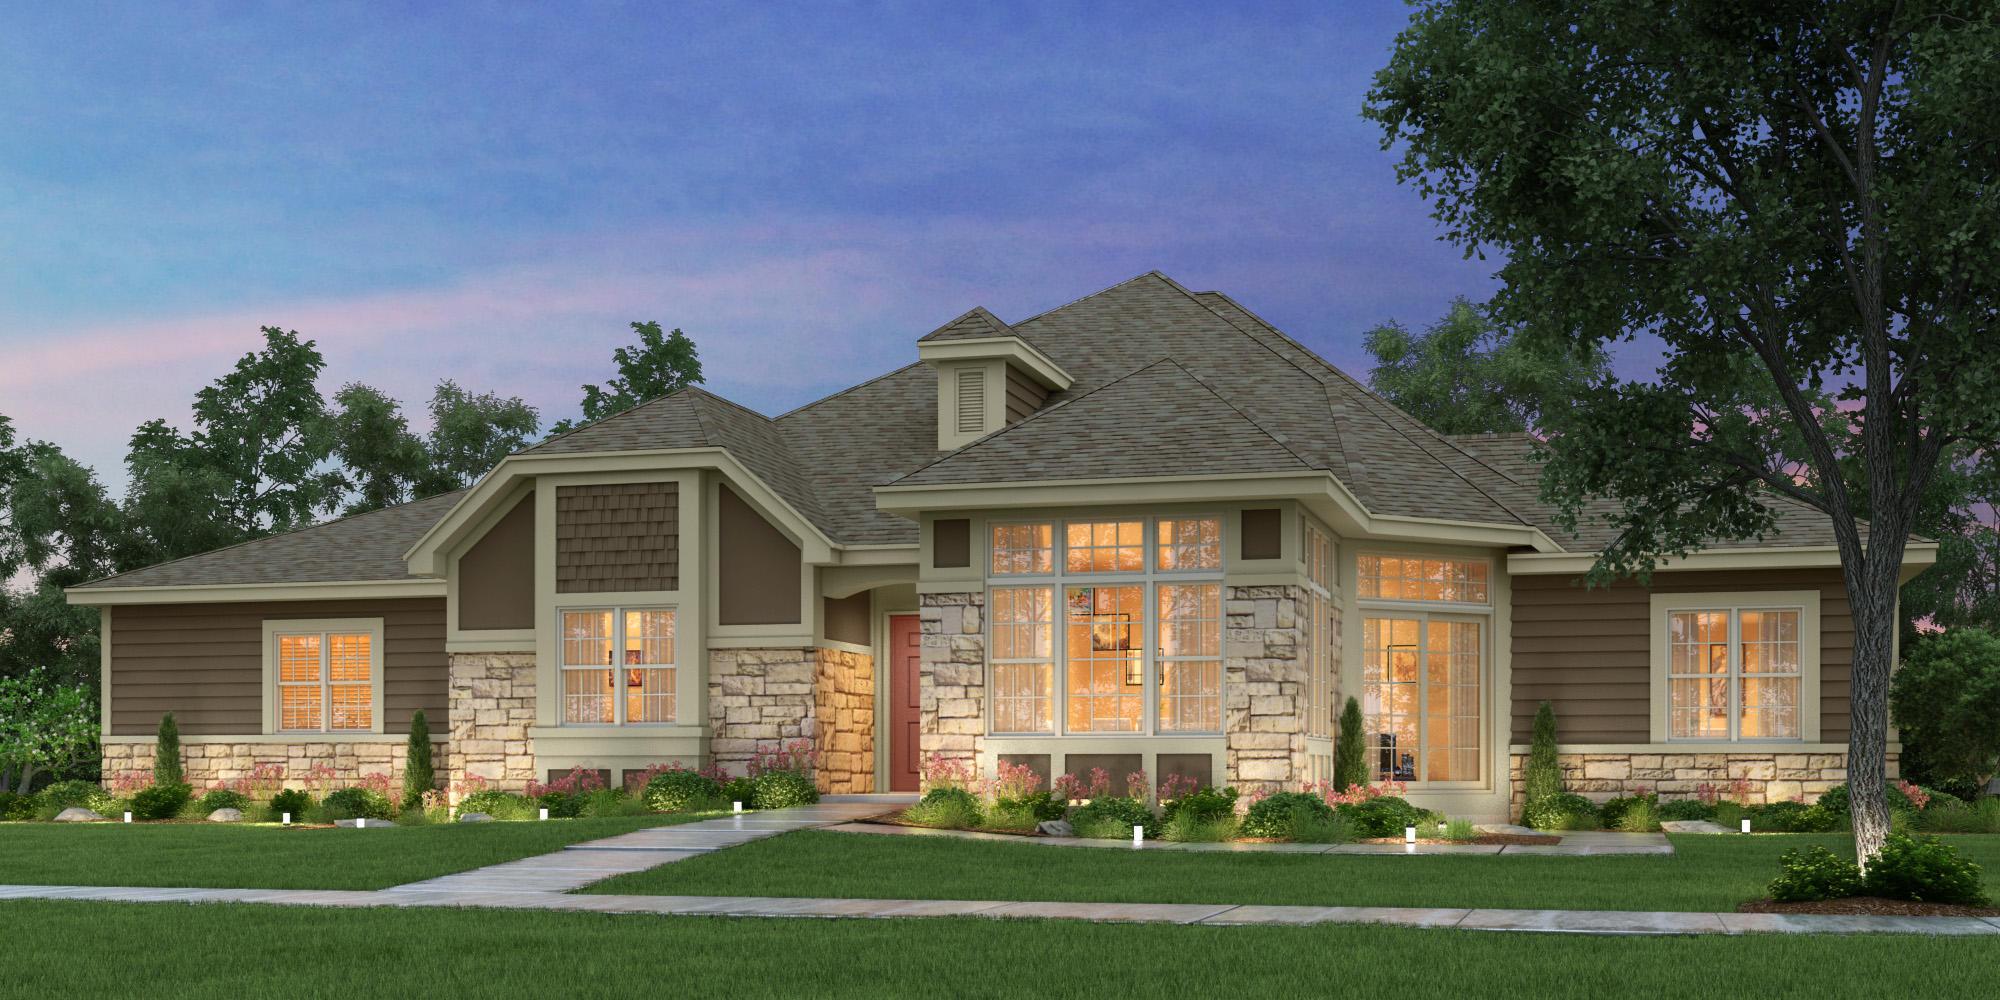 4359 Creekside Pass, Brookfield, Wisconsin 53005, 2 Bedrooms Bedrooms, 7 Rooms Rooms,2 BathroomsBathrooms,Condominiums,For Sale,Creekside Pass,1,1722625